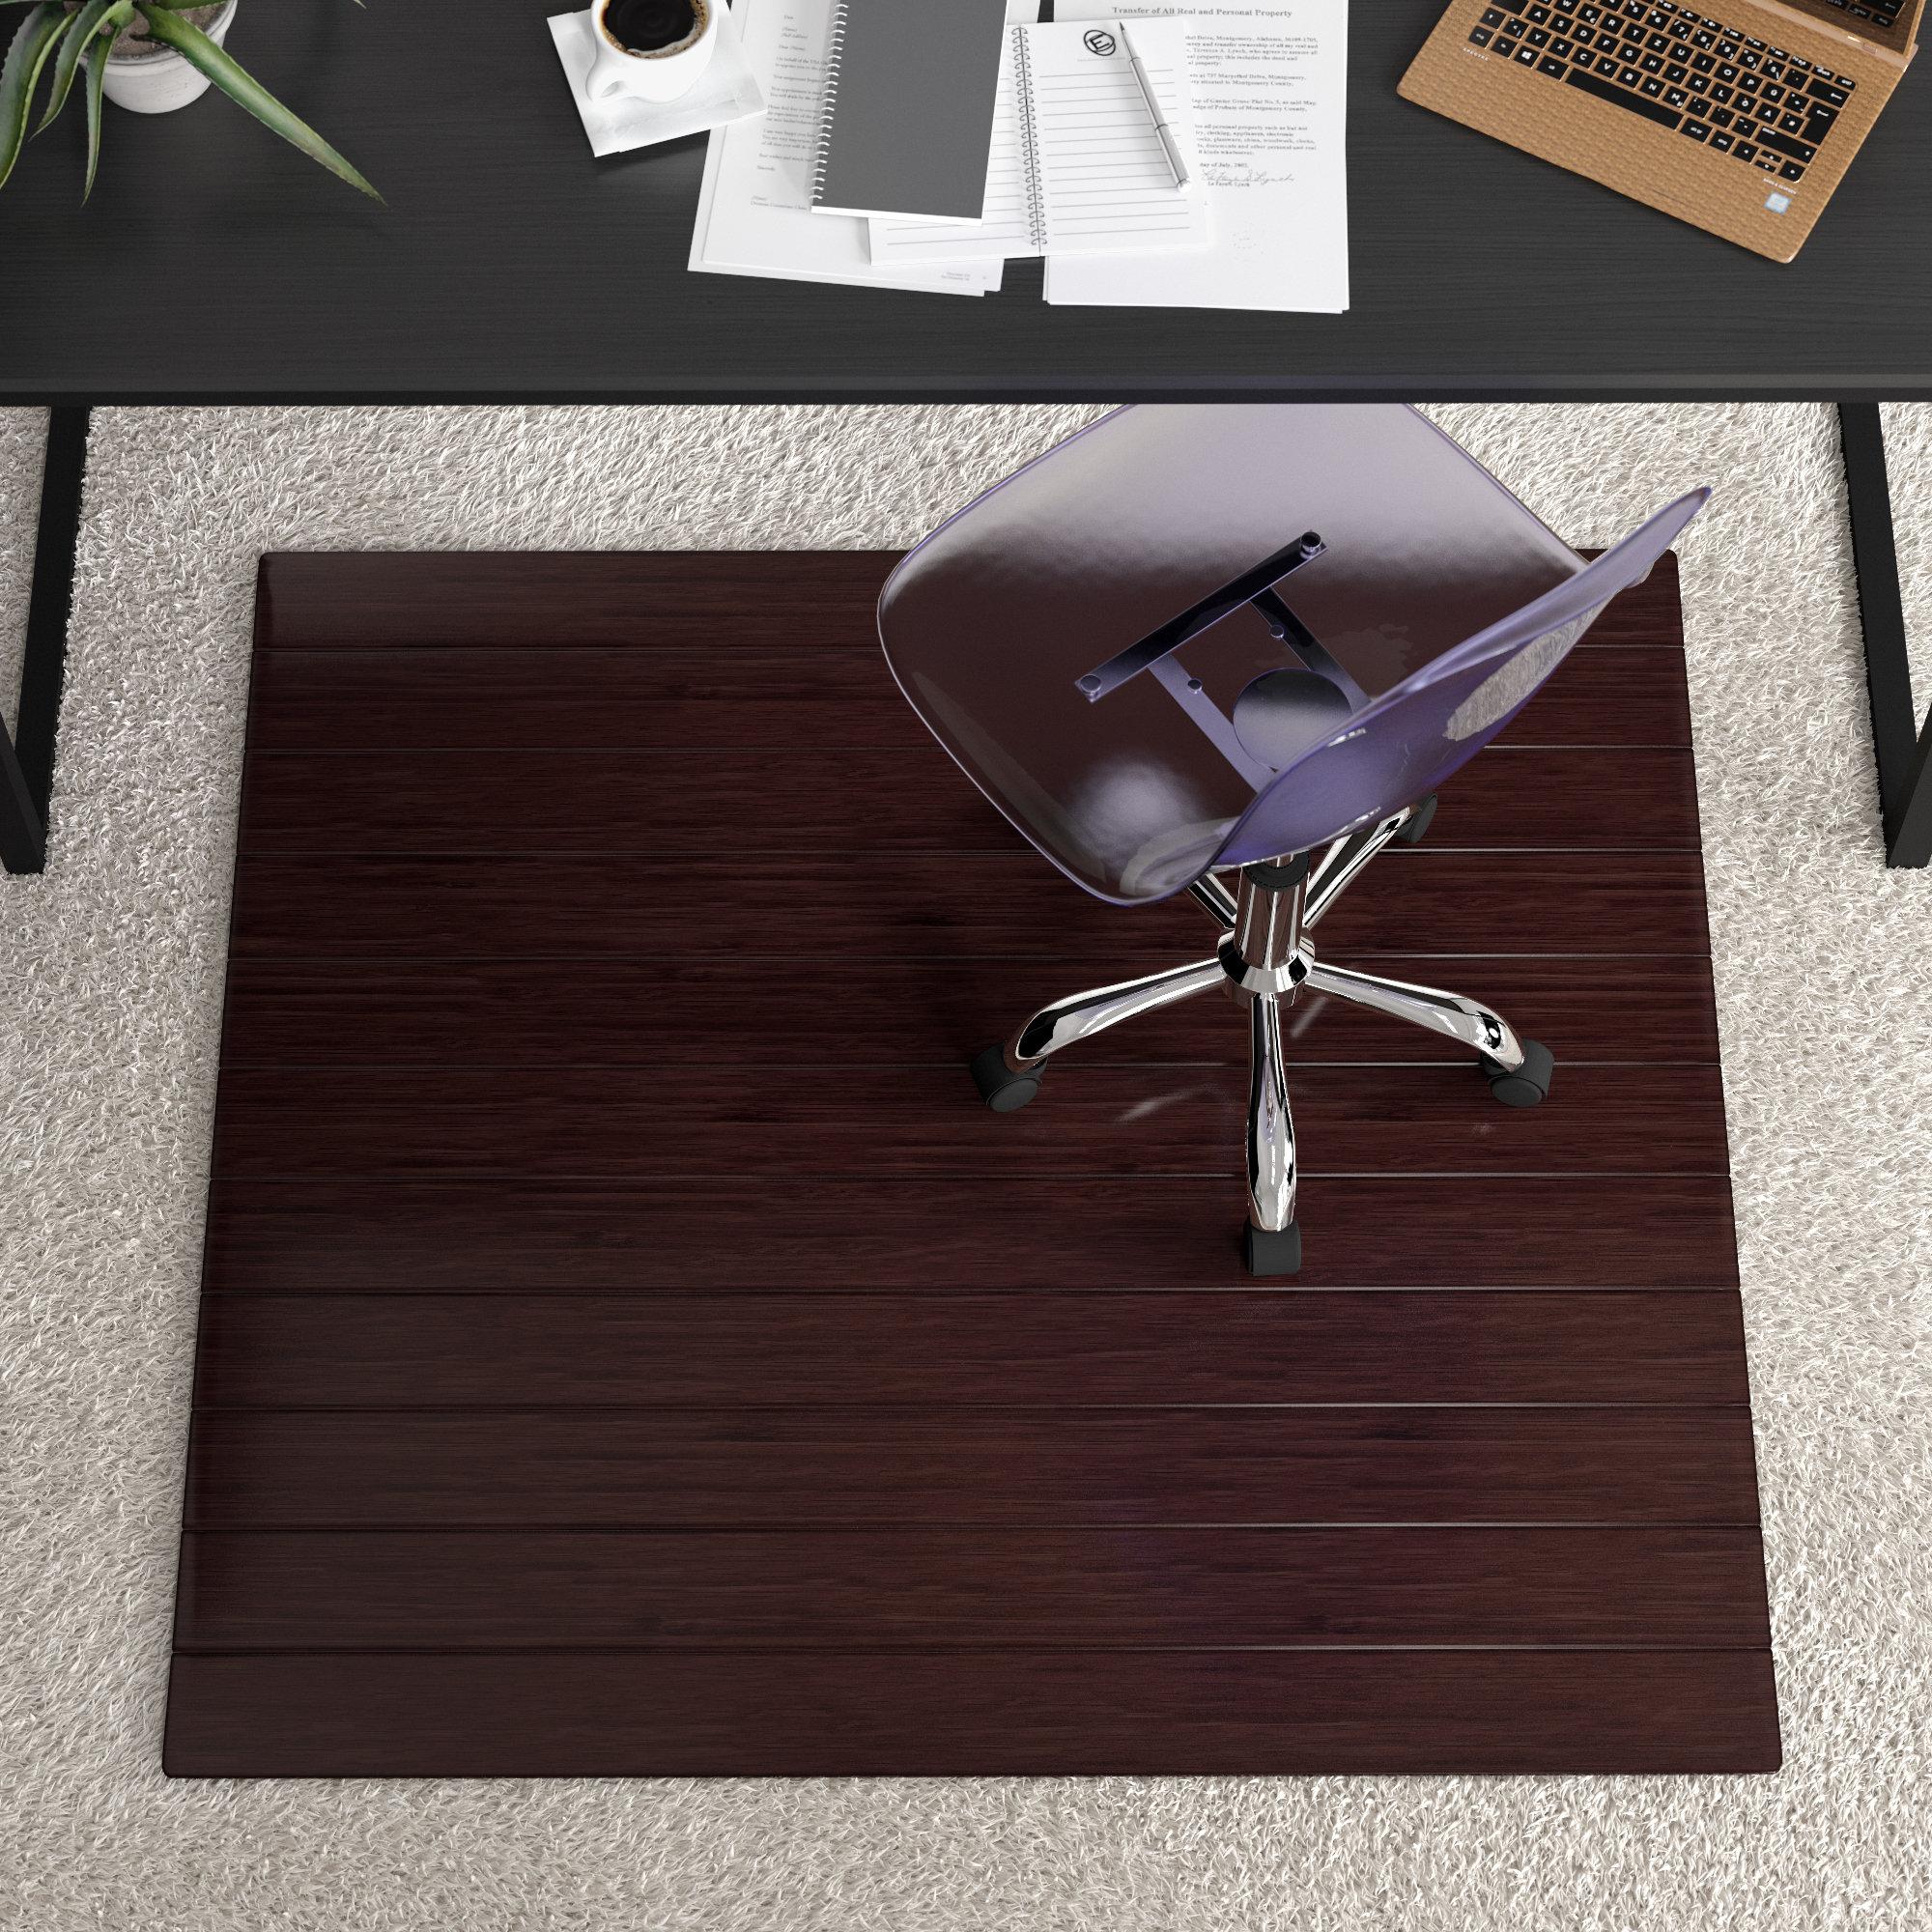 Symple Stuff Bamboo Office Chair Mat